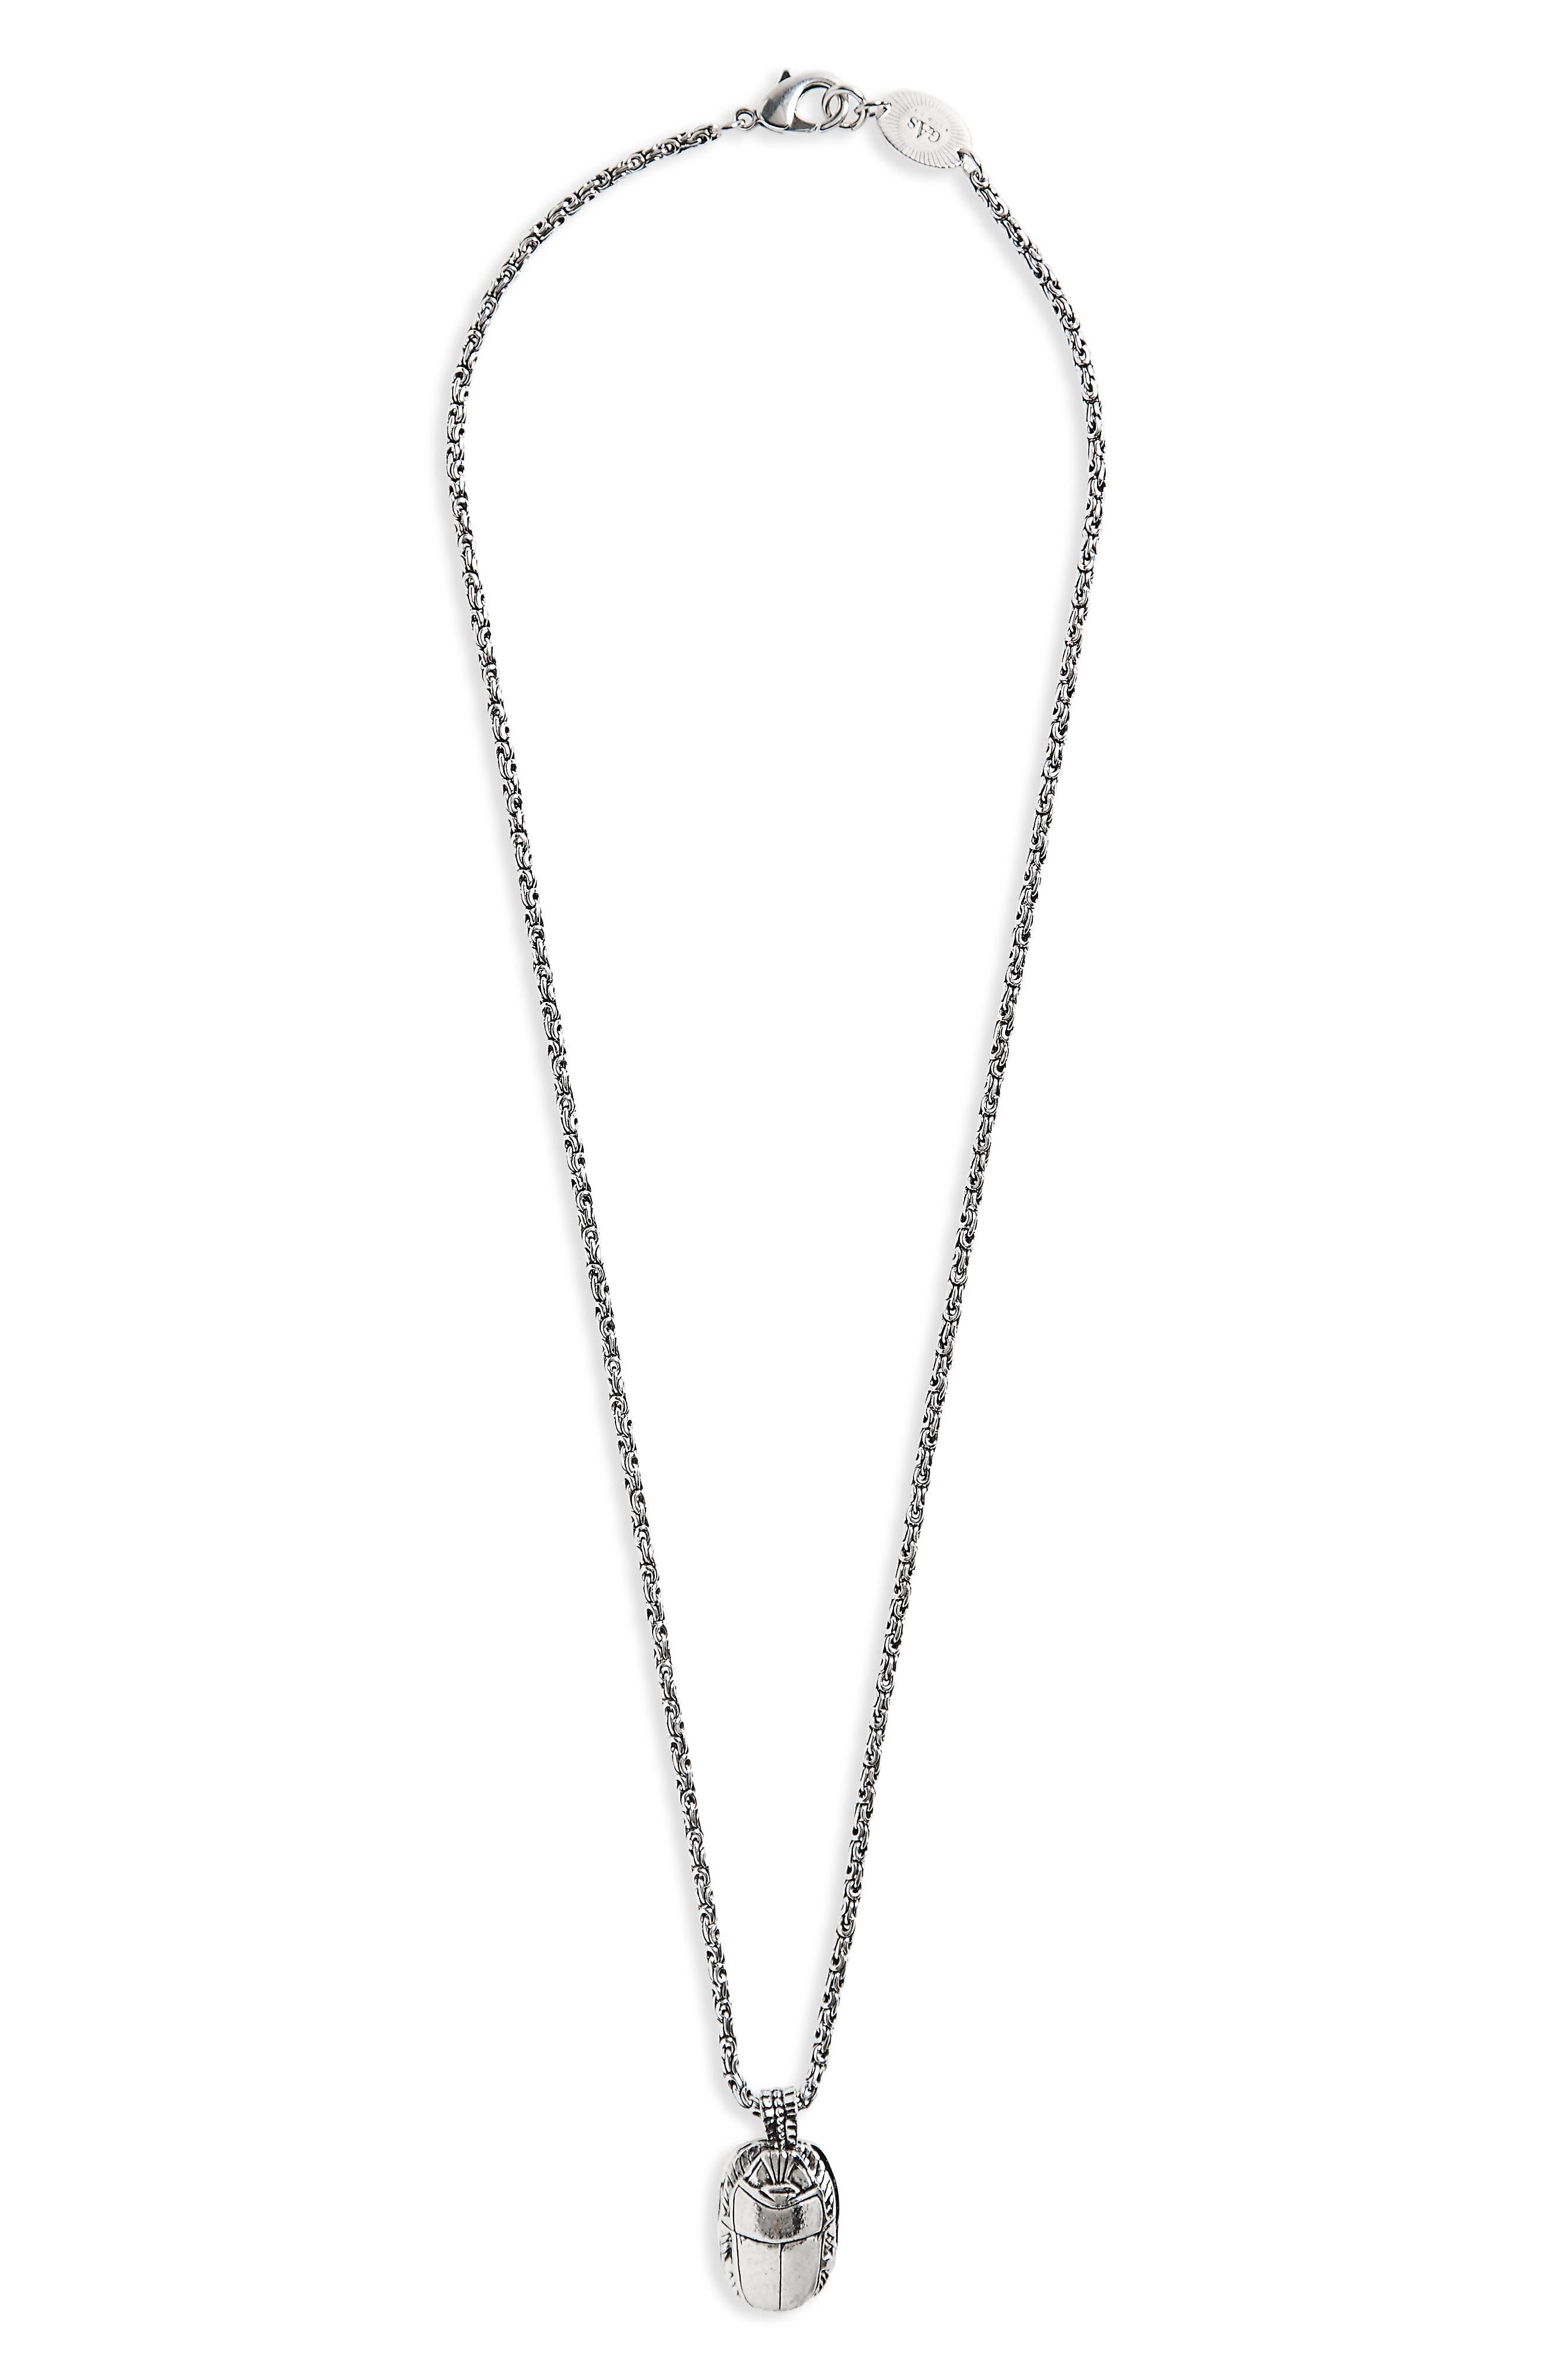 Scrabee Pendant Necklace,                         Main,                         color, Silver